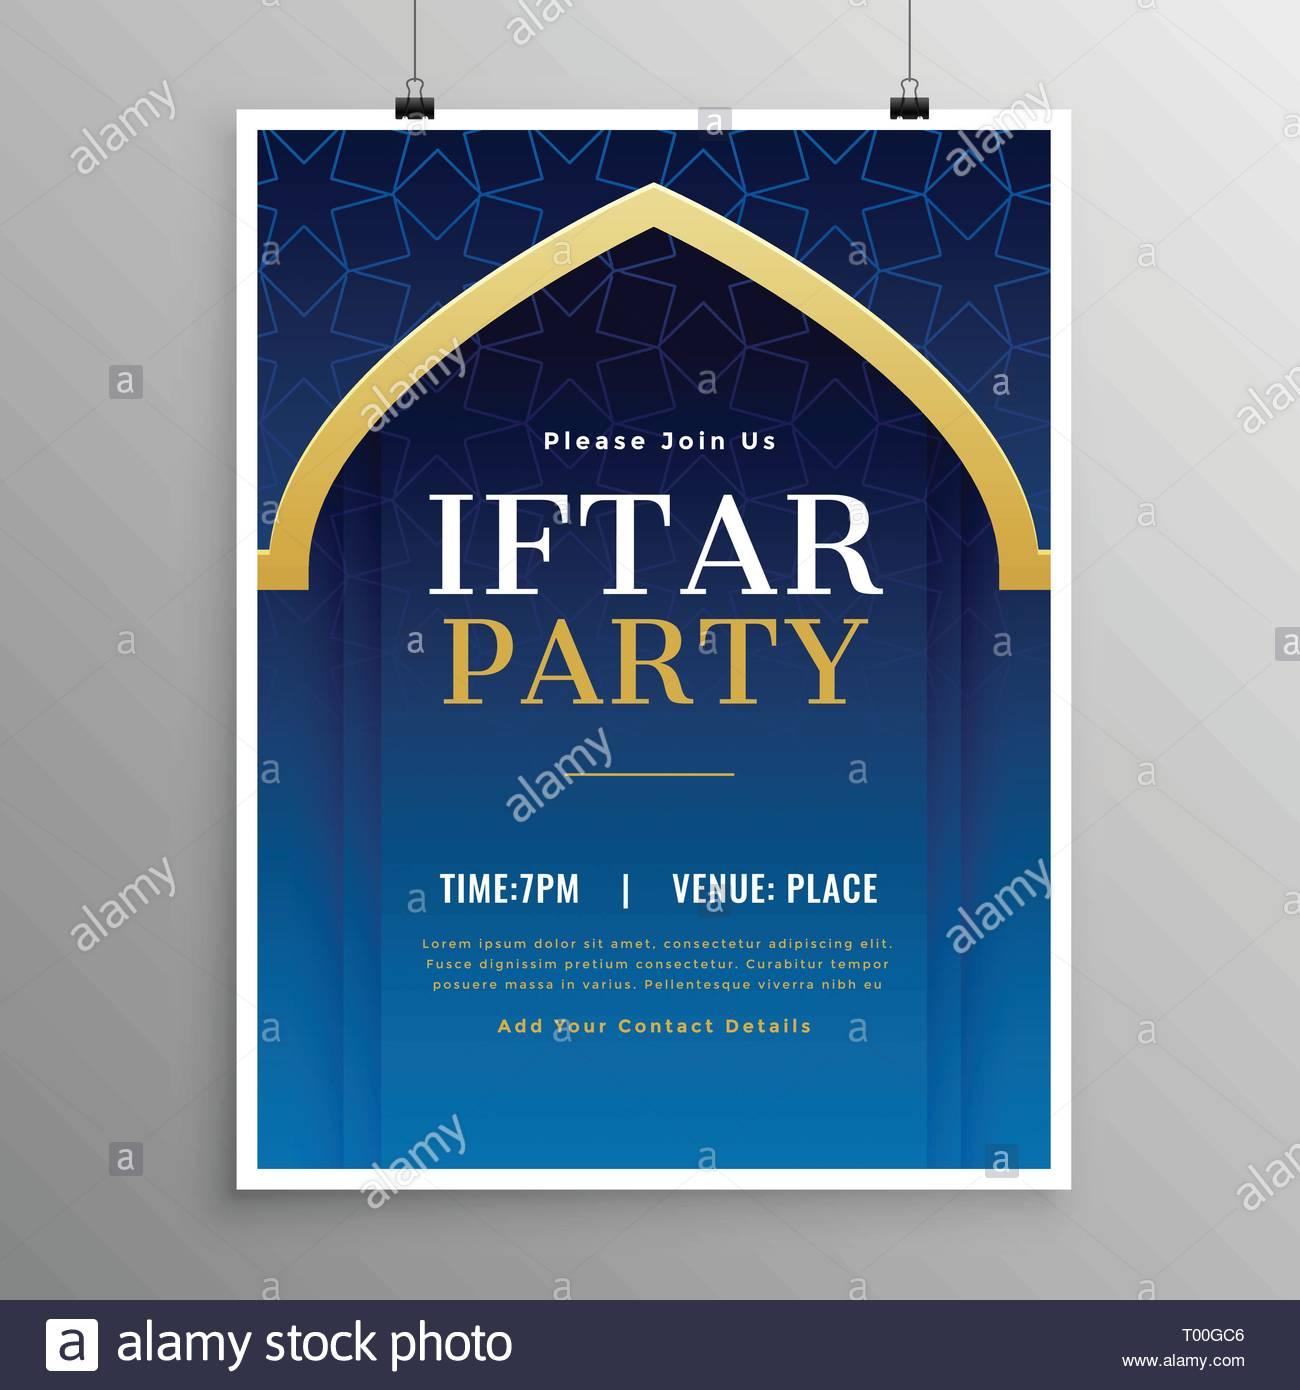 Ramadan Iftar Party Invitation Template Stock Vector Art